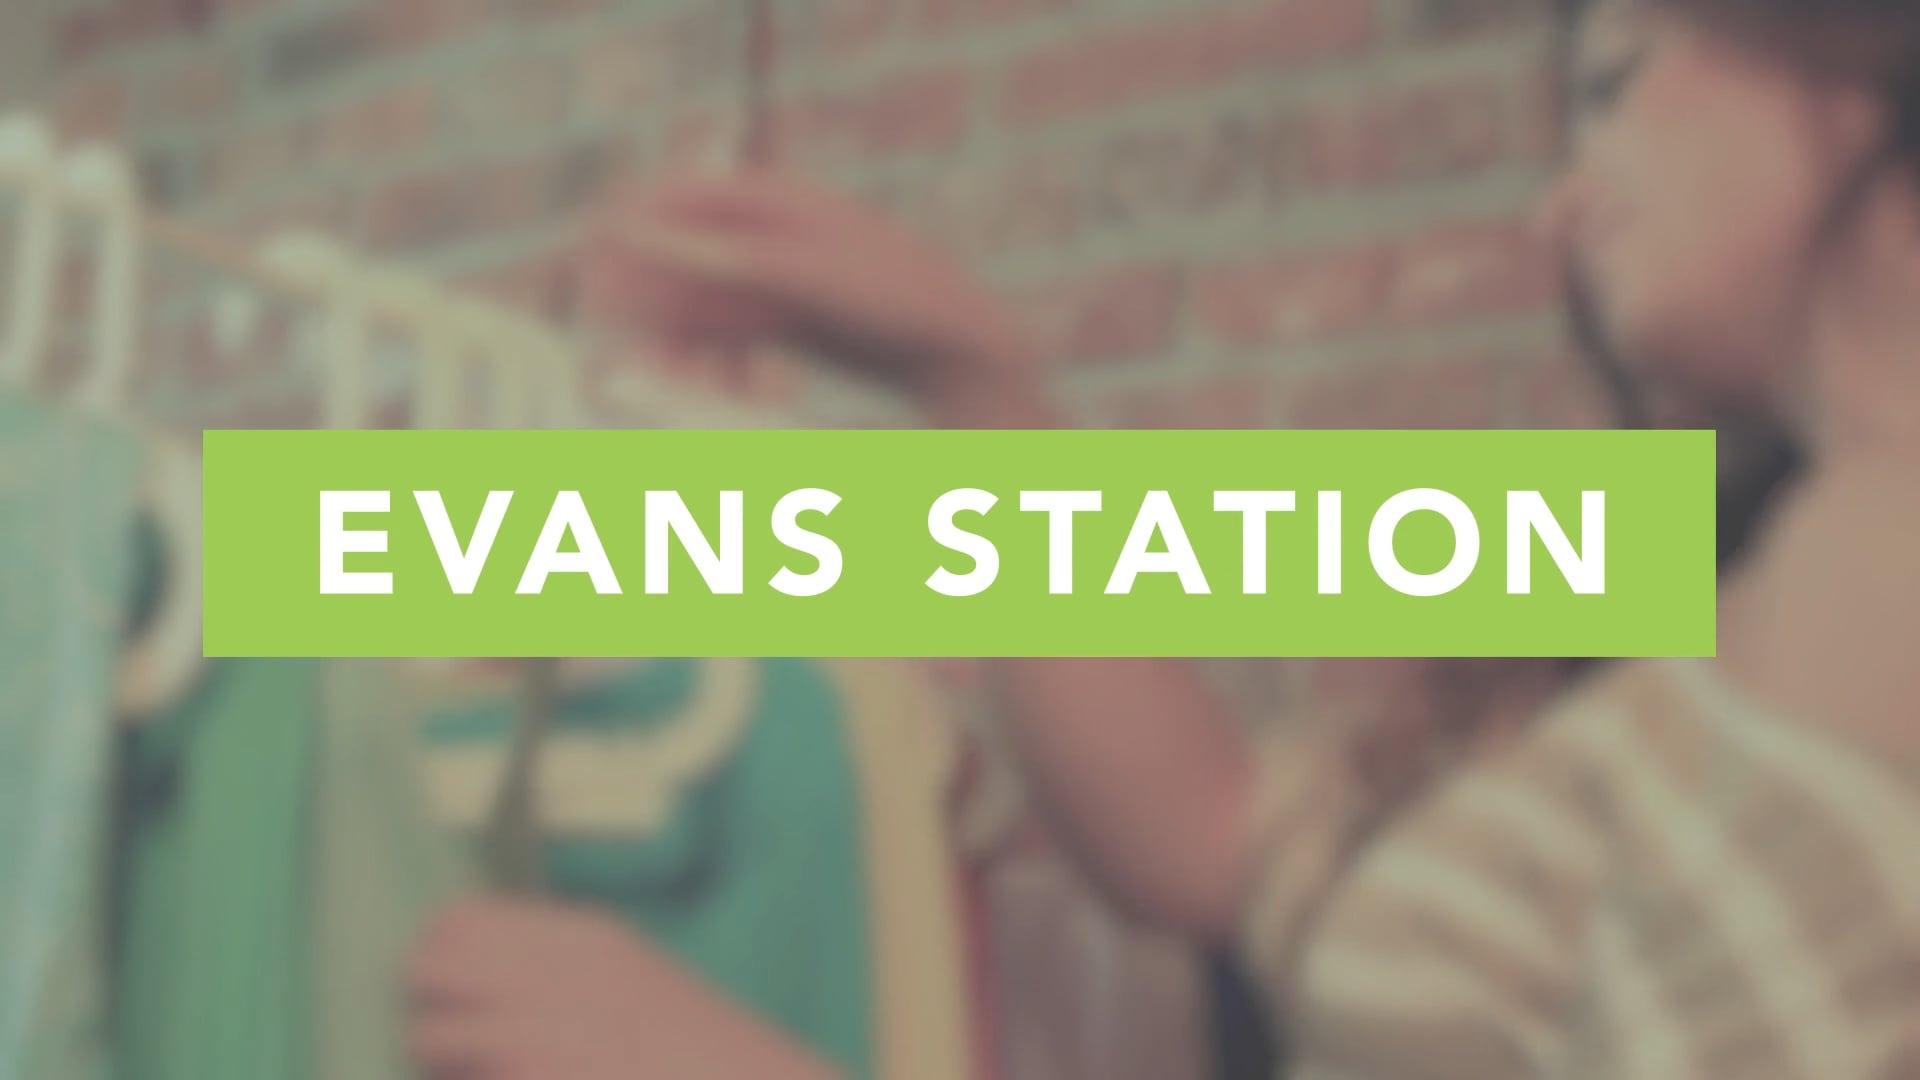 TM - Evans Station